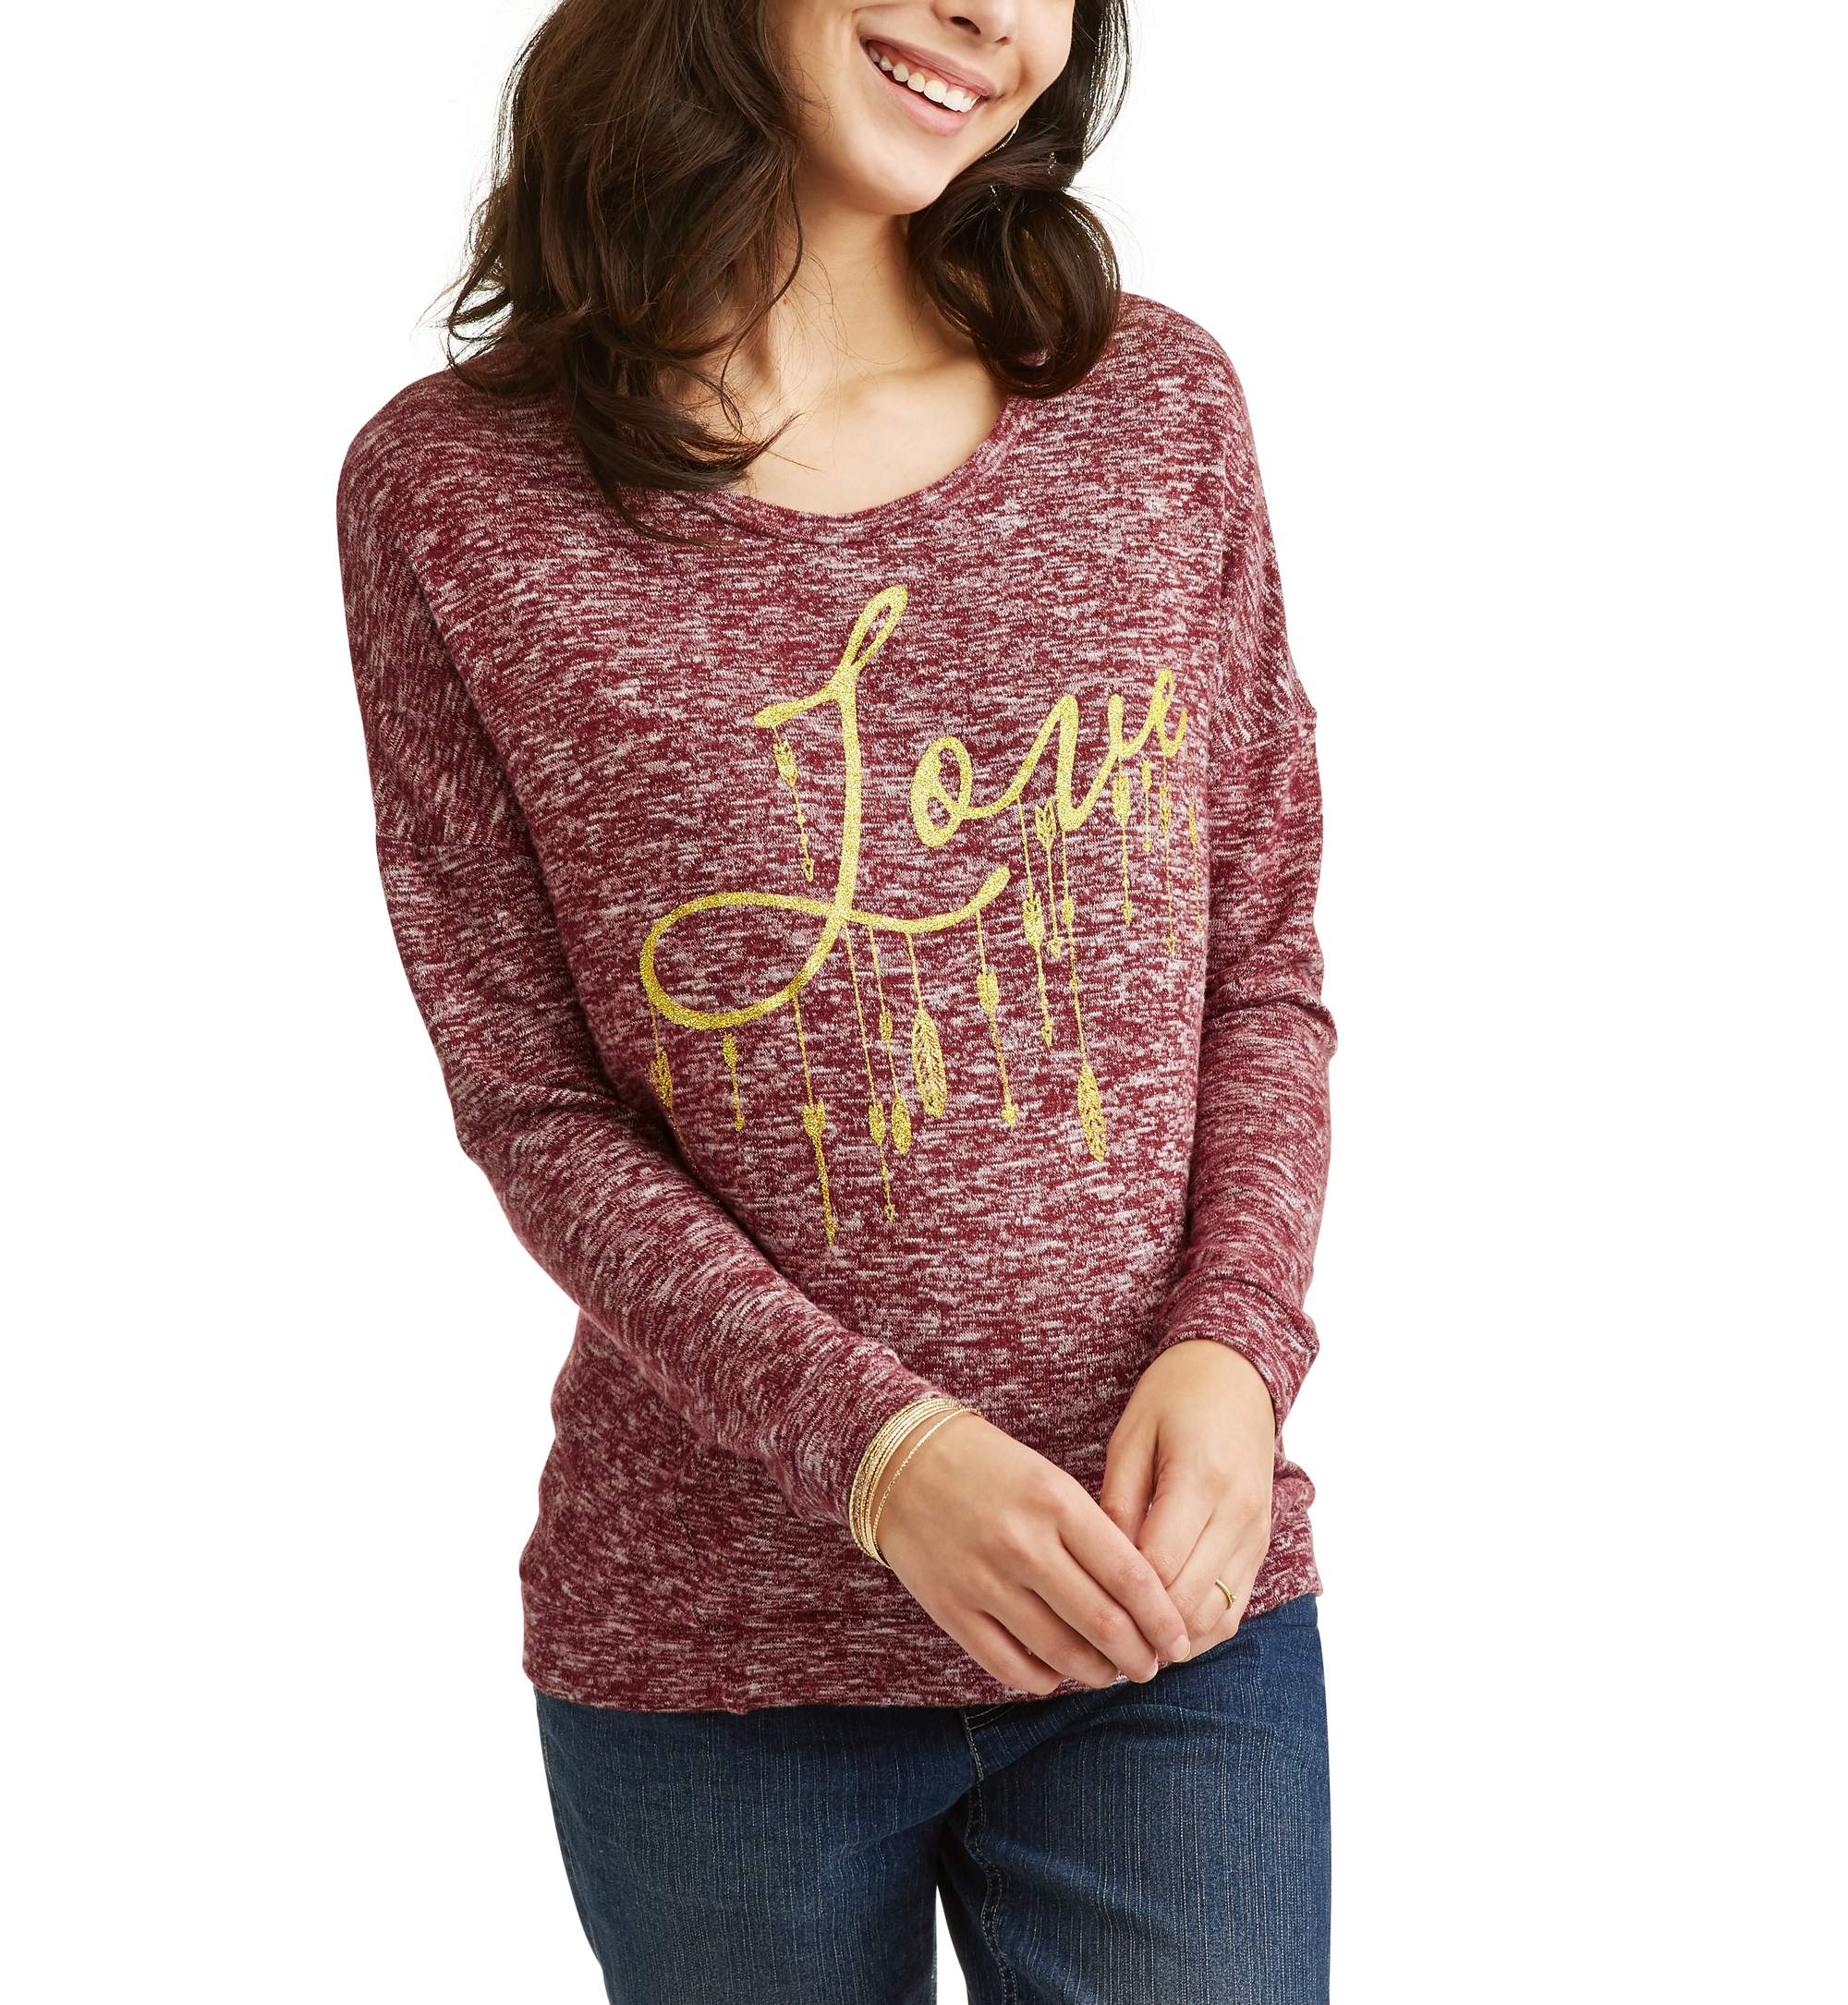 Maternity Love Graphic Sweatshirt by White Mark